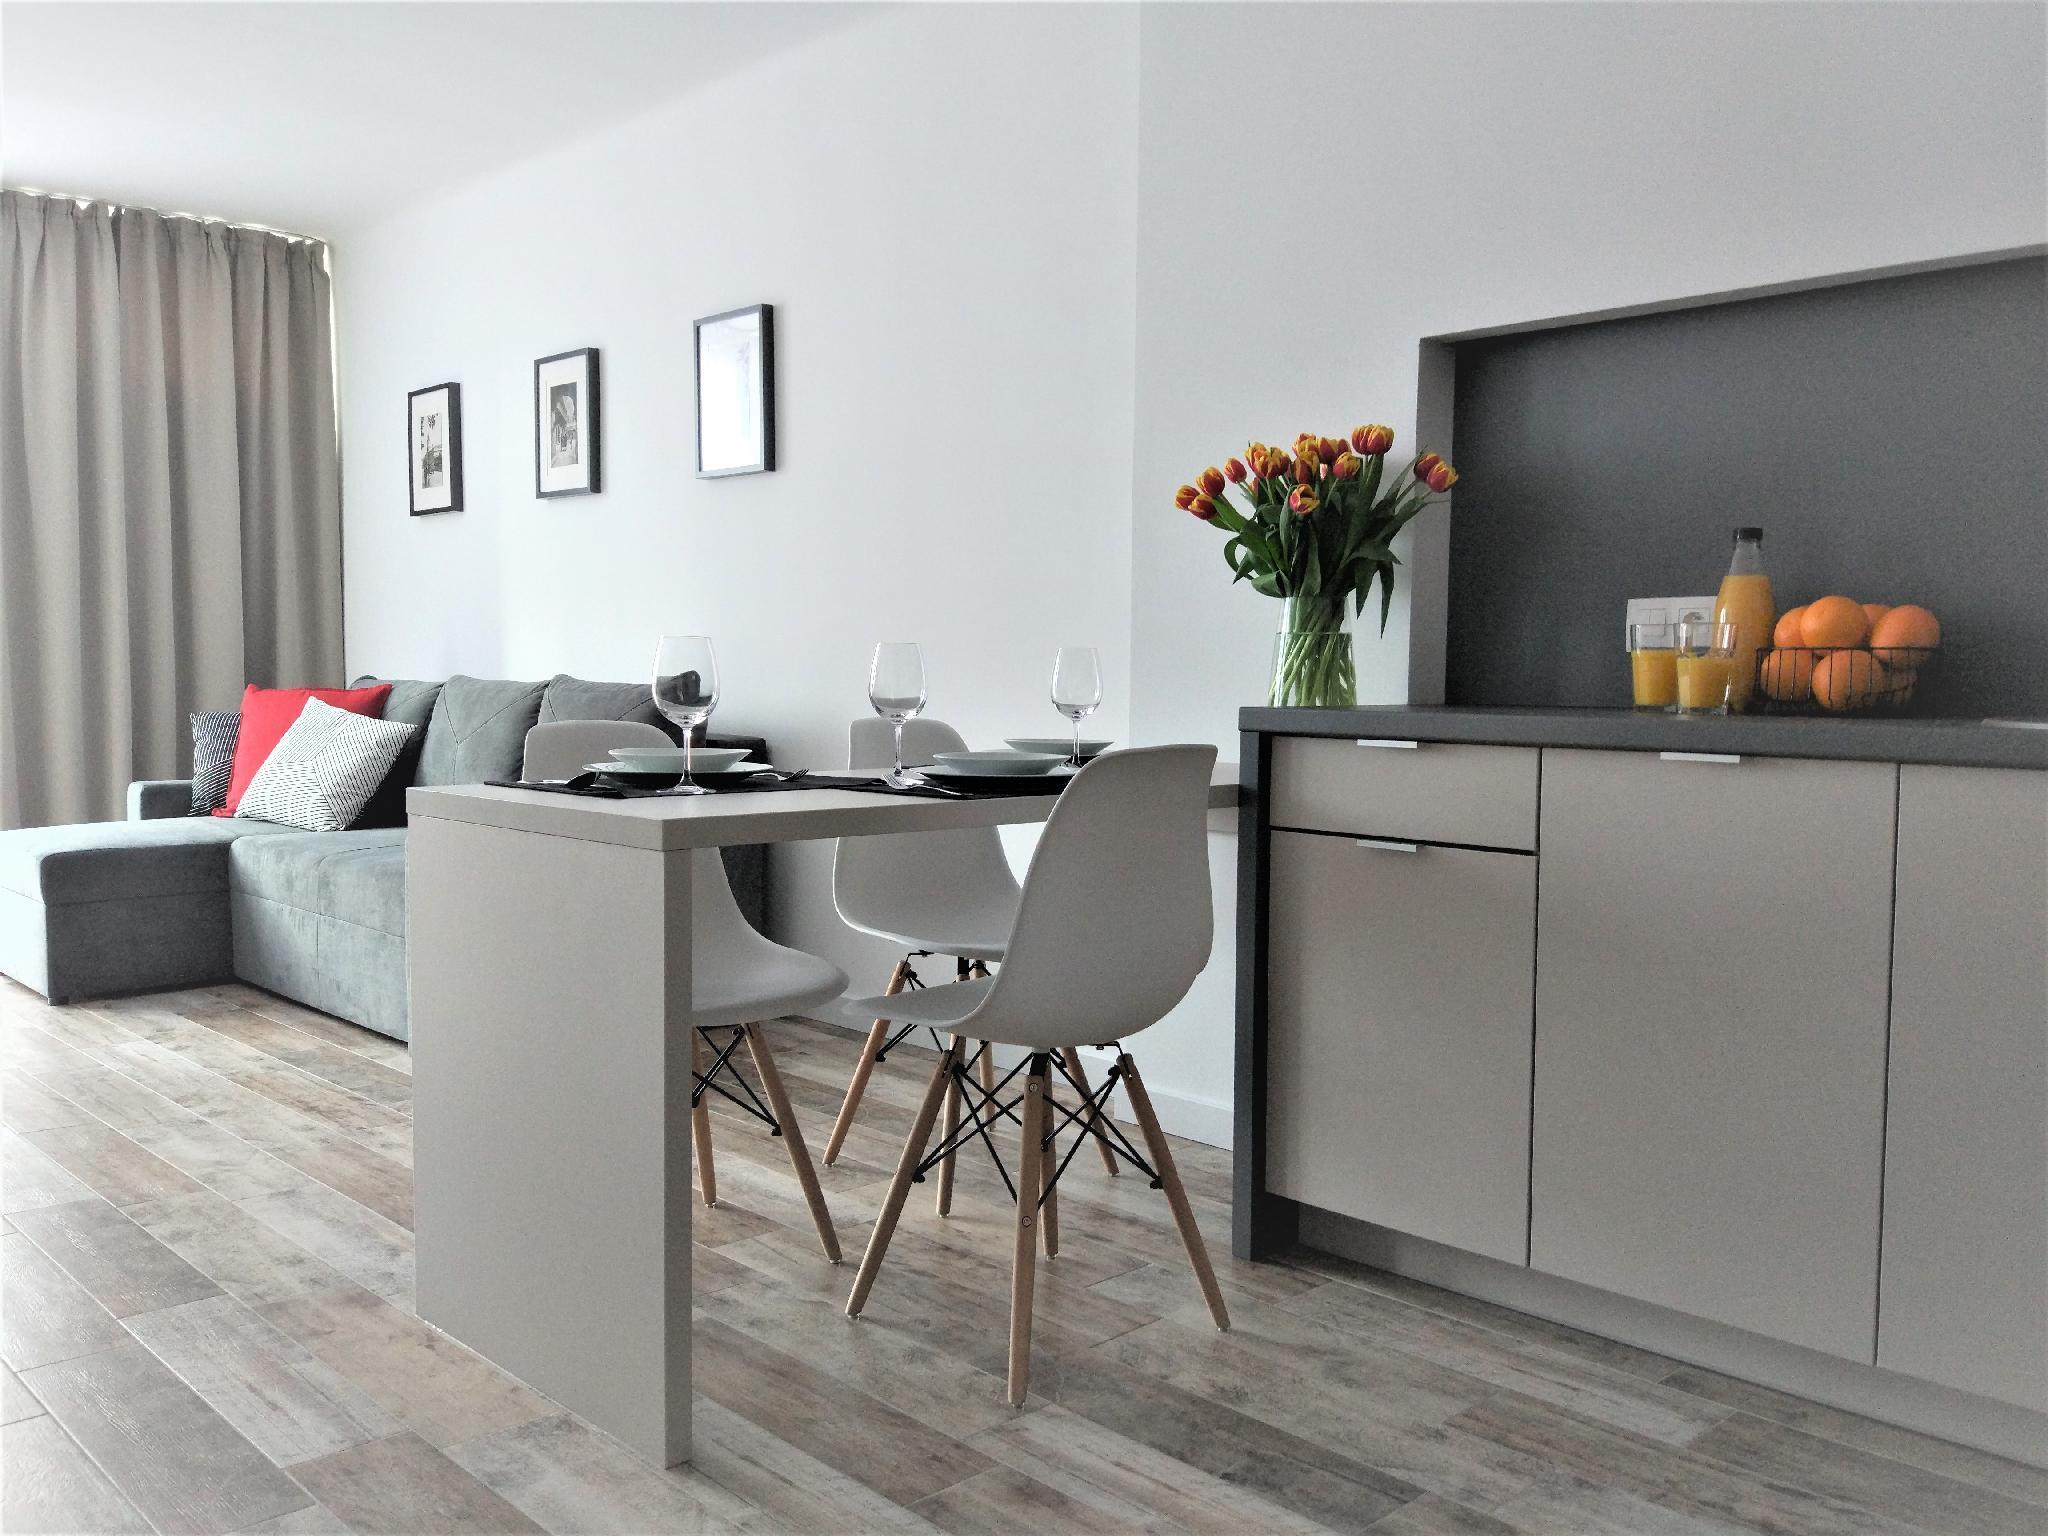 WarsawSkyLine Apartments